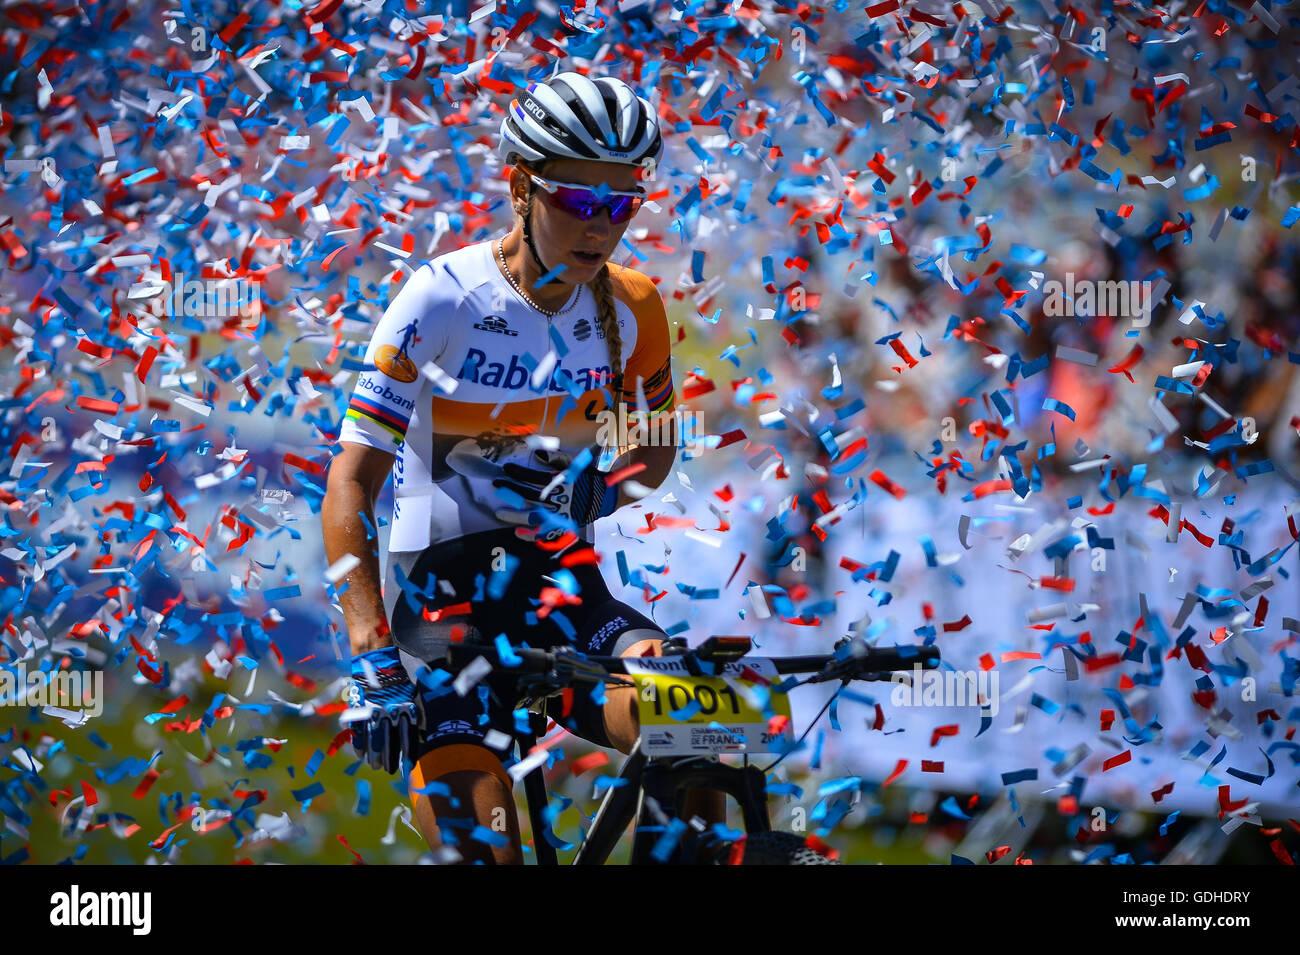 Montgenevre, France. 16th July, 2016. French mountain bike championship 2016. Women finish line FERRAND PREVOT Pauline - Stock Image